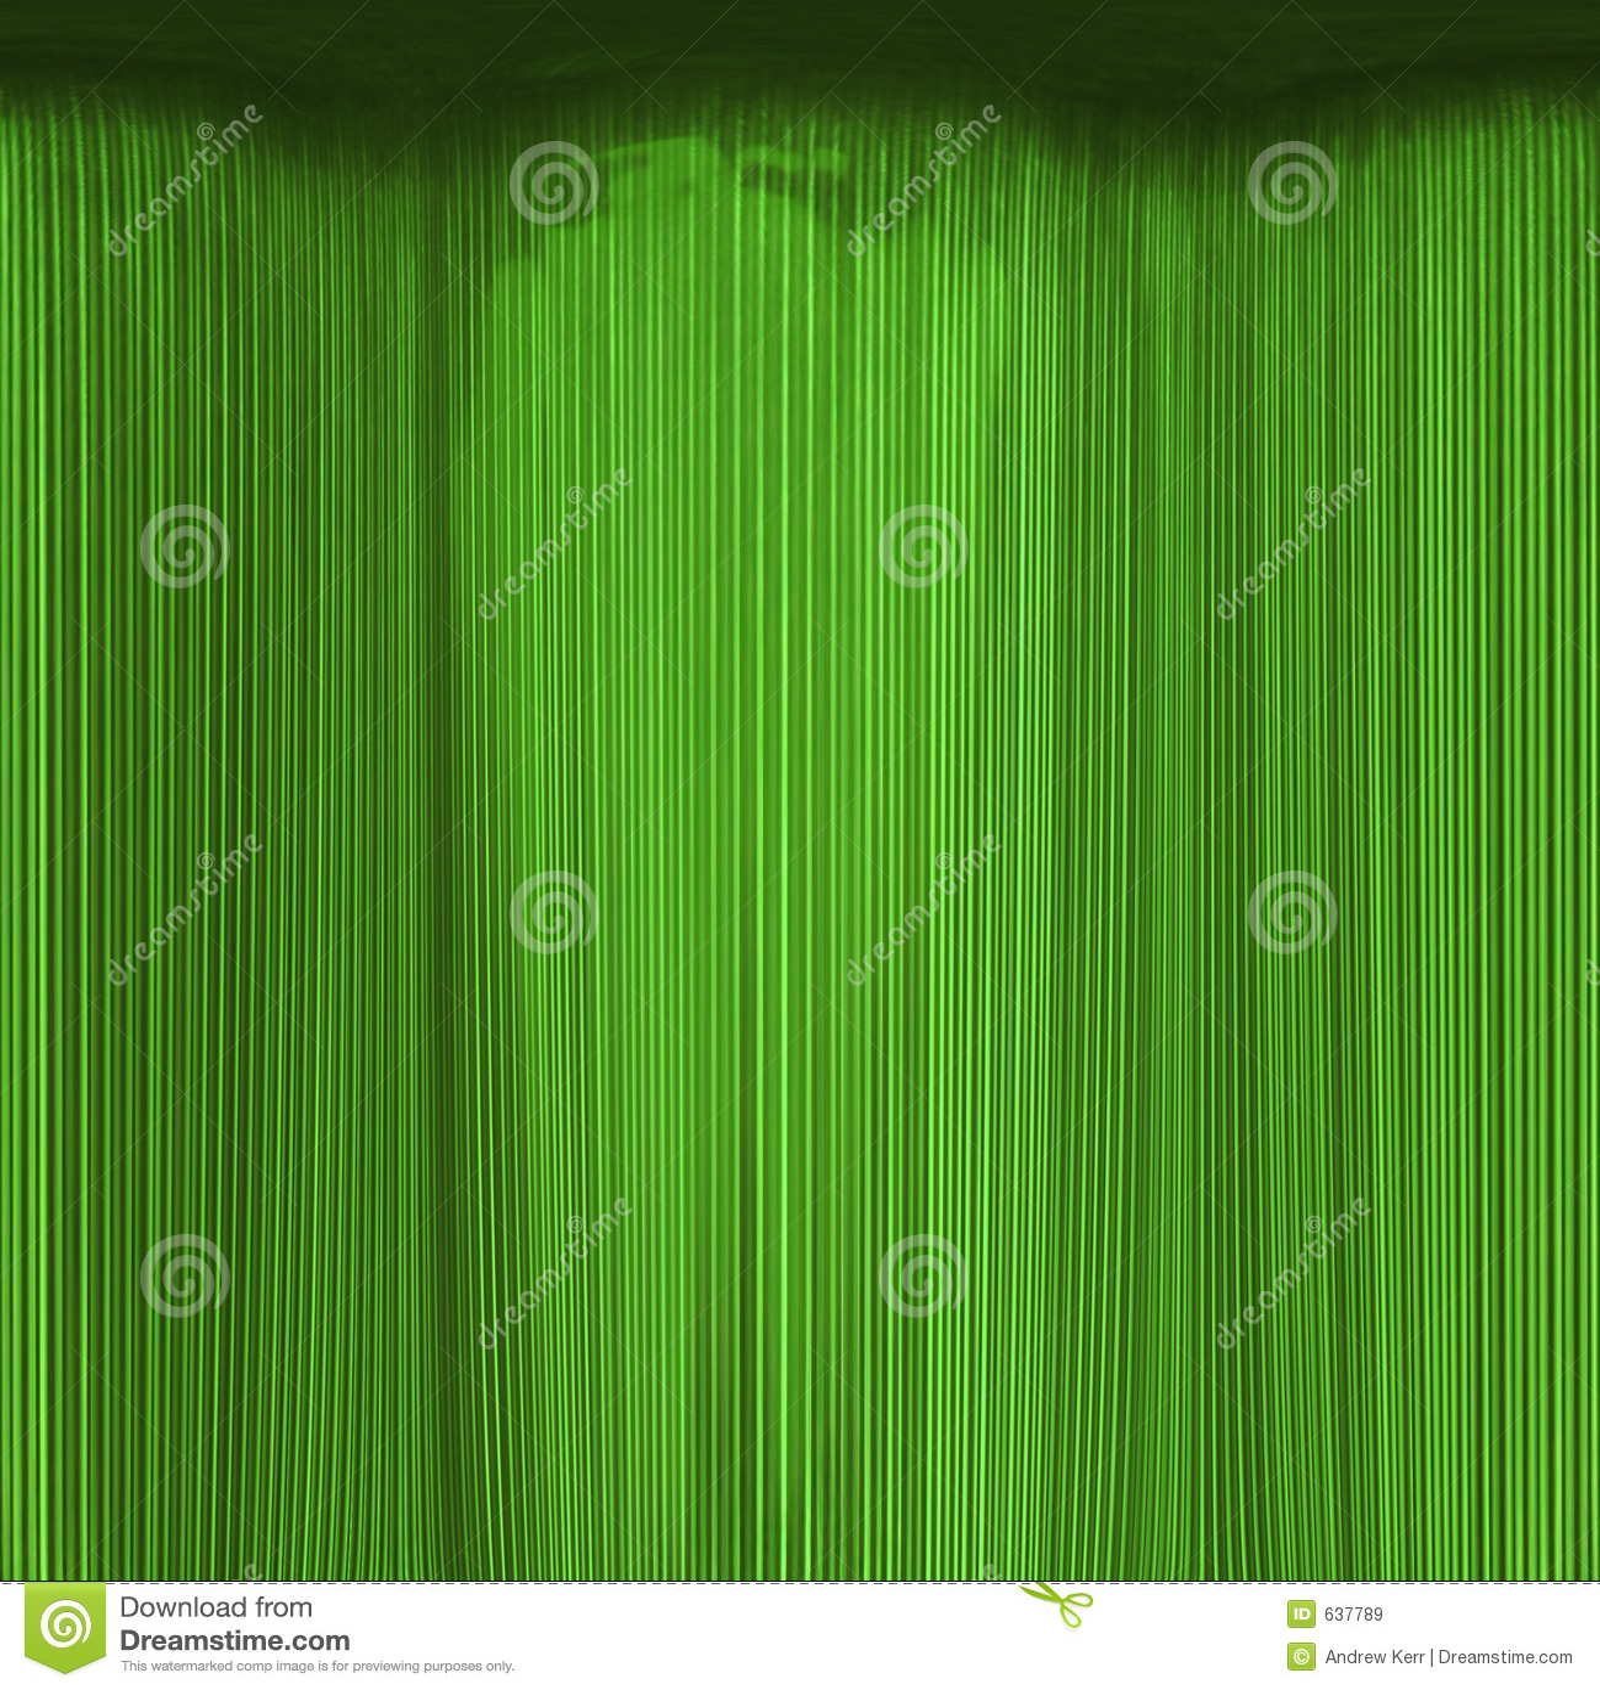 Textura da cortina do verde de esmeralda